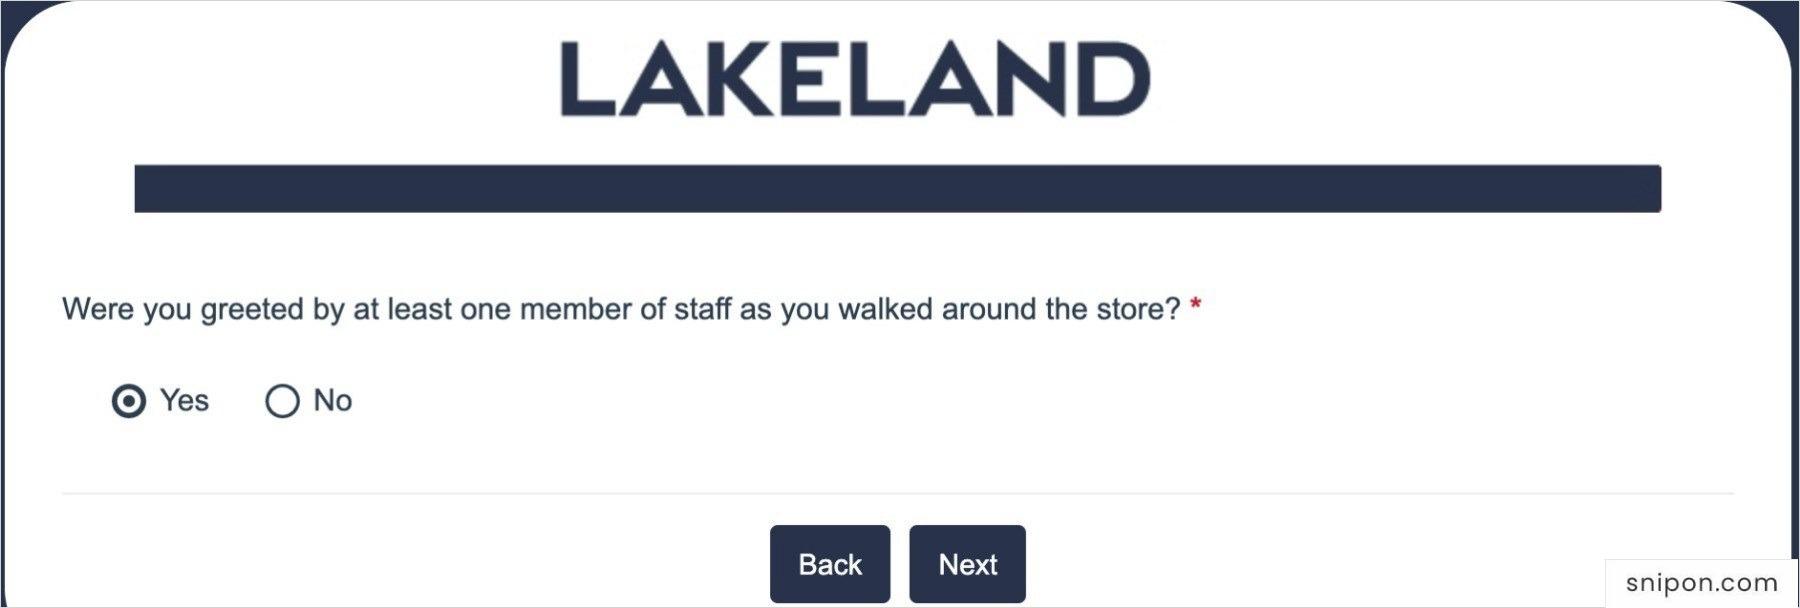 Were You Greeted? Lakeland Survey